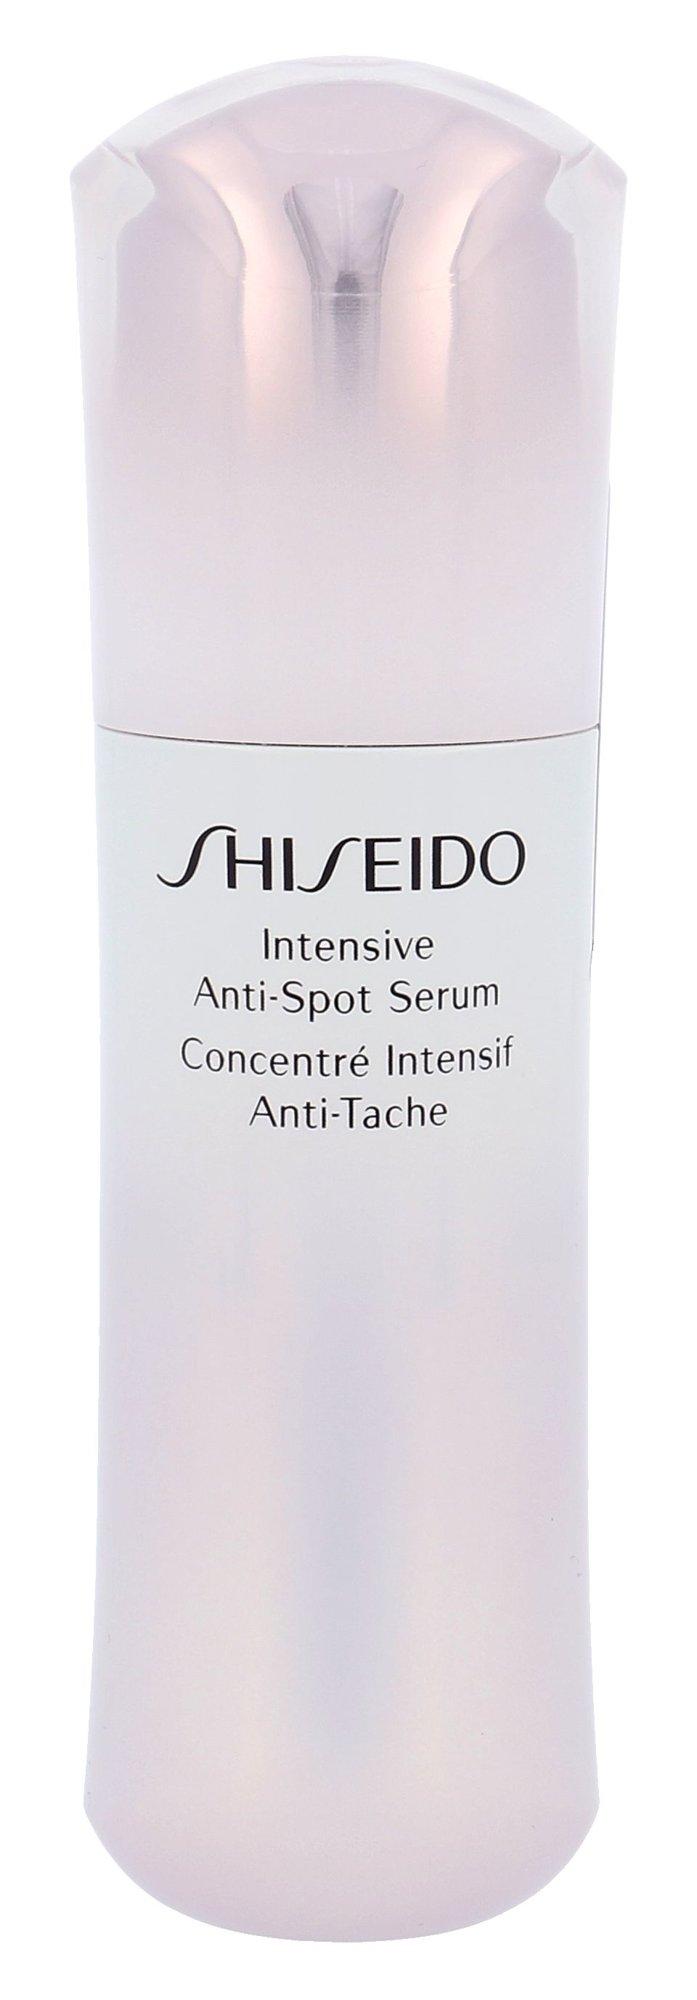 Shiseido Intensive Anti Spot Serum Cosmetic 30ml